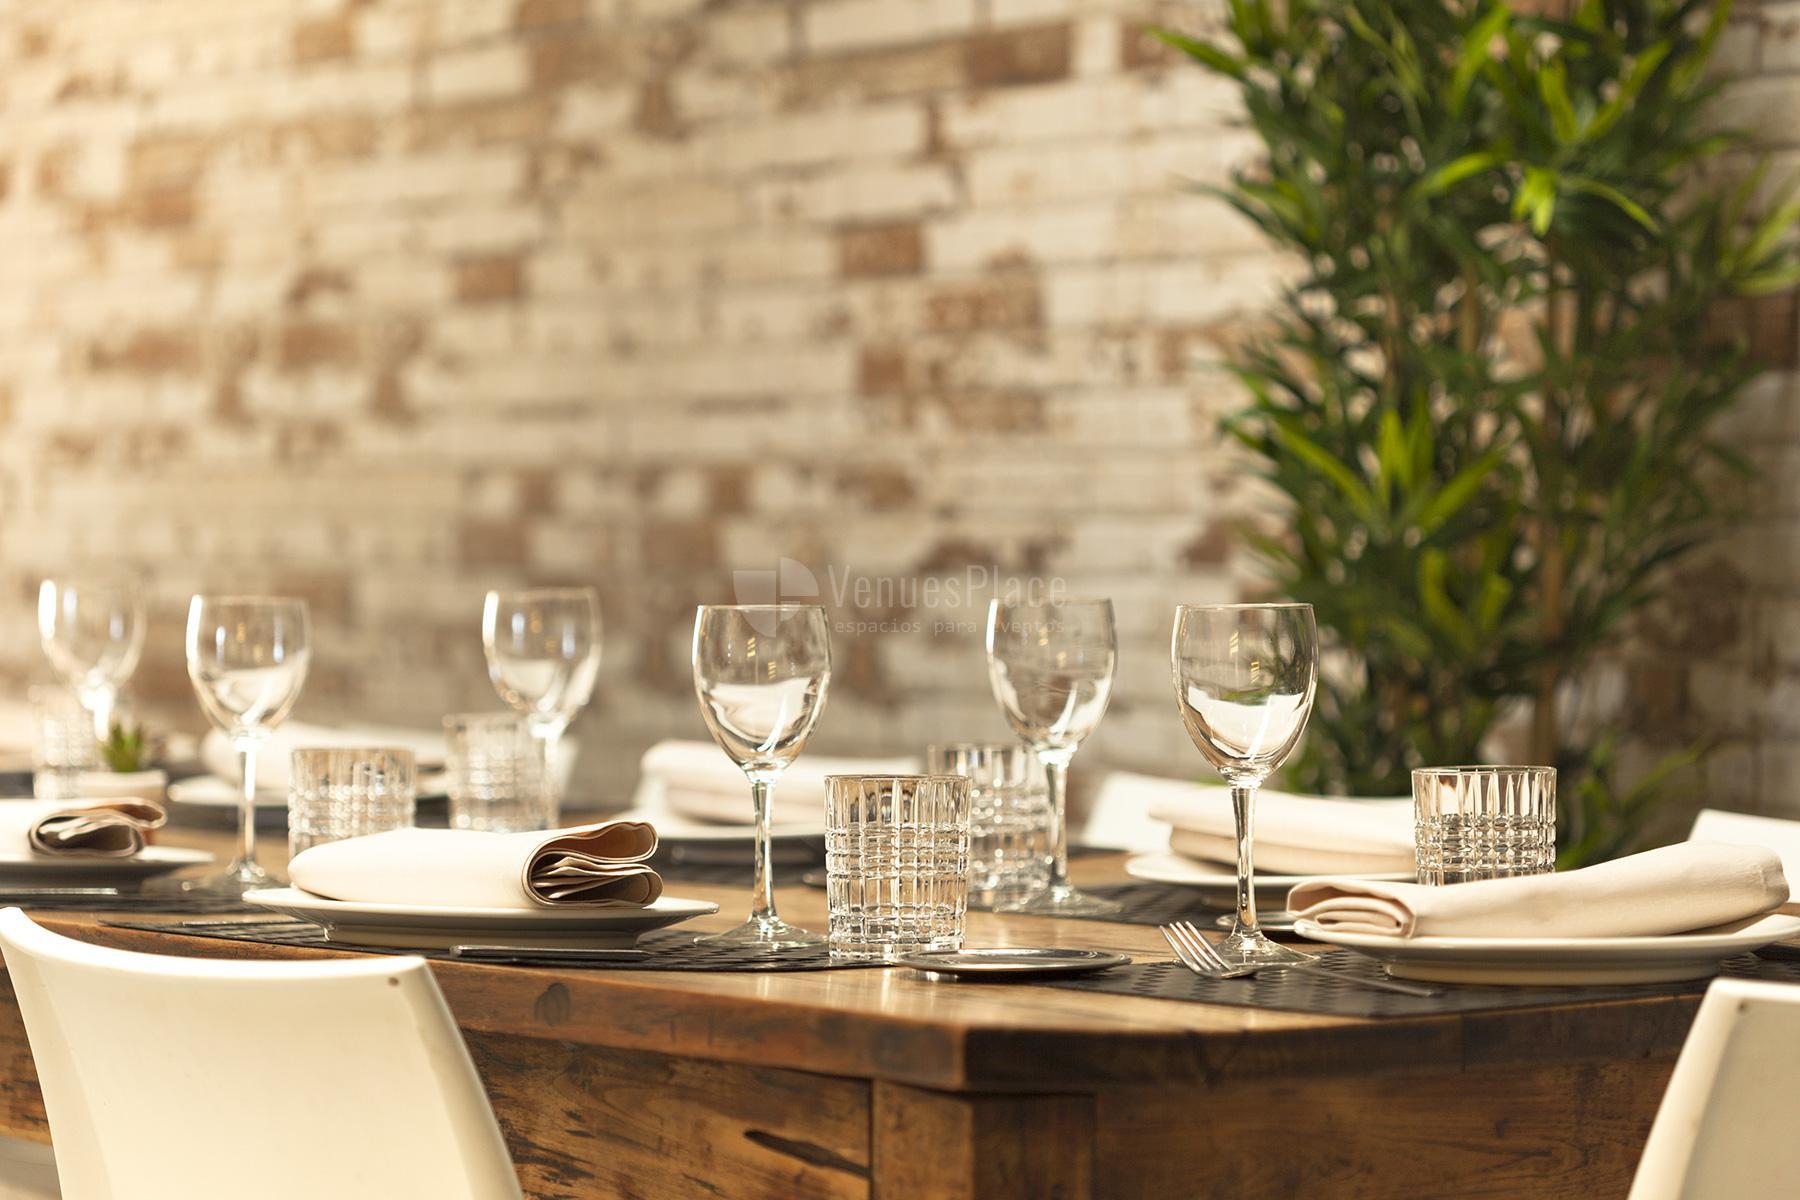 Tu evento a medida en Roseta Restaurante